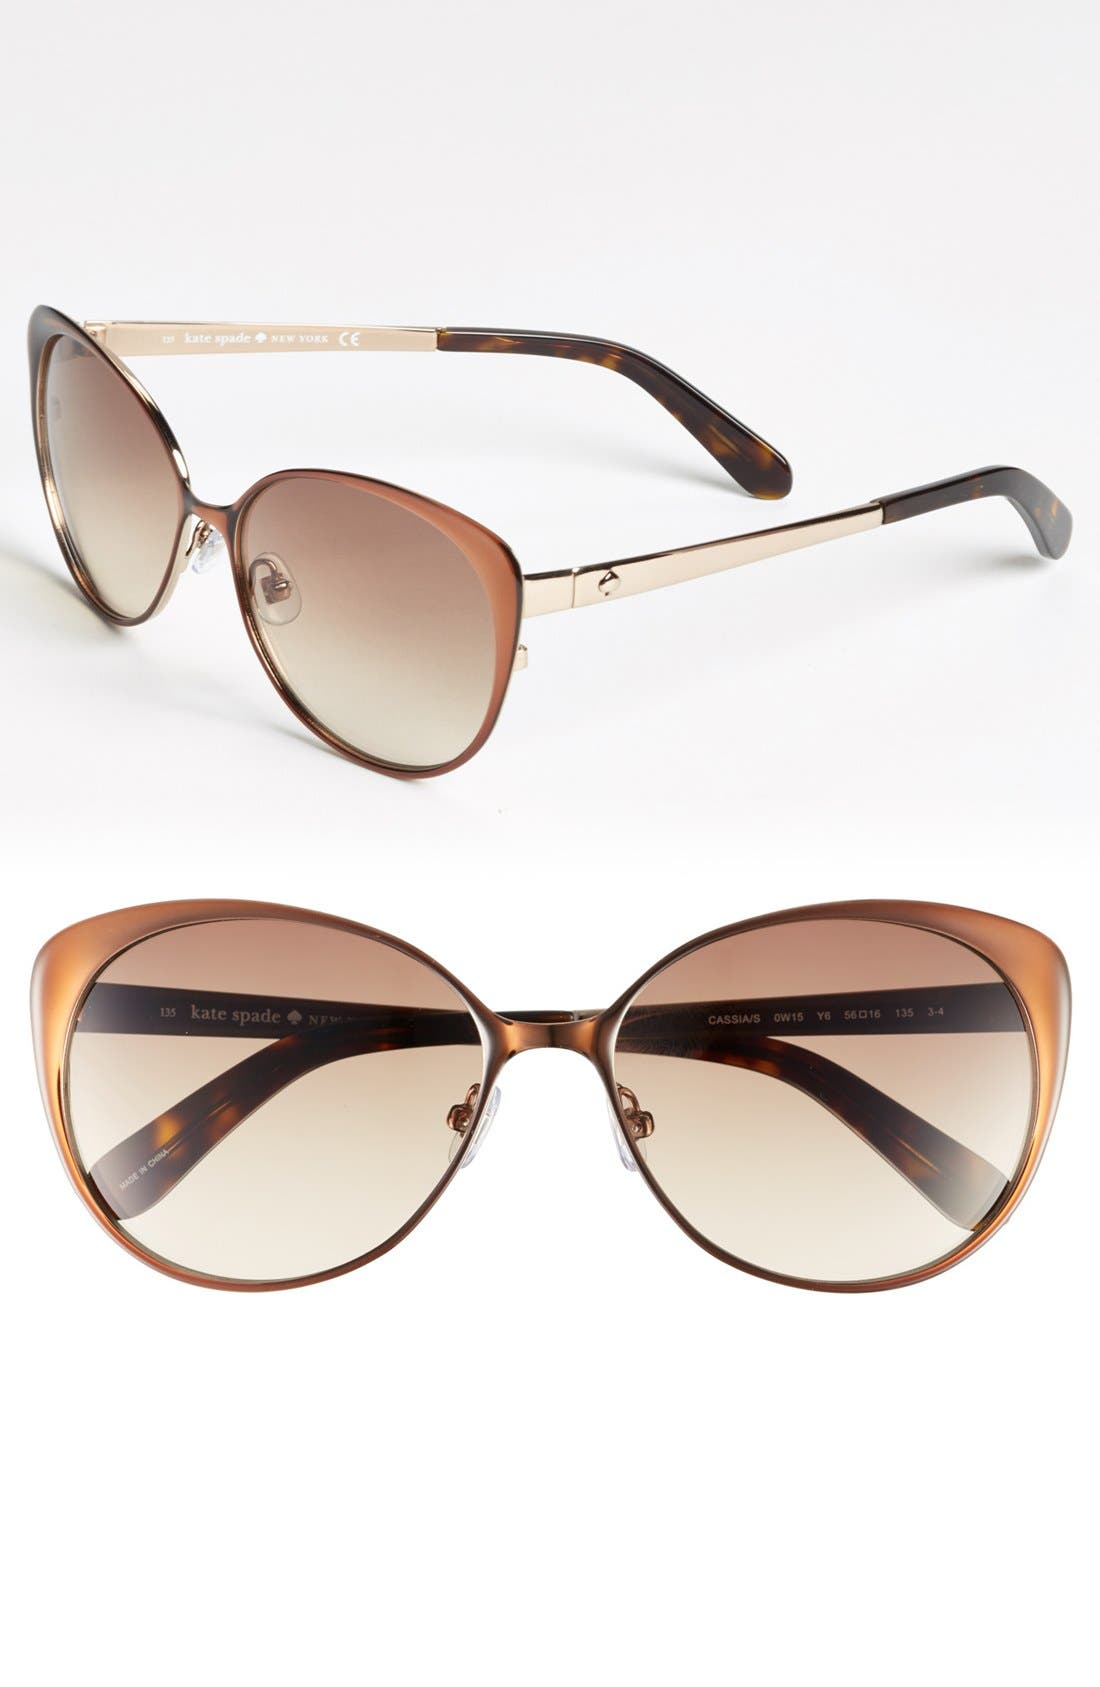 Main Image - kate spade new york 'cassia' 56mm metal cat eye sunglasses